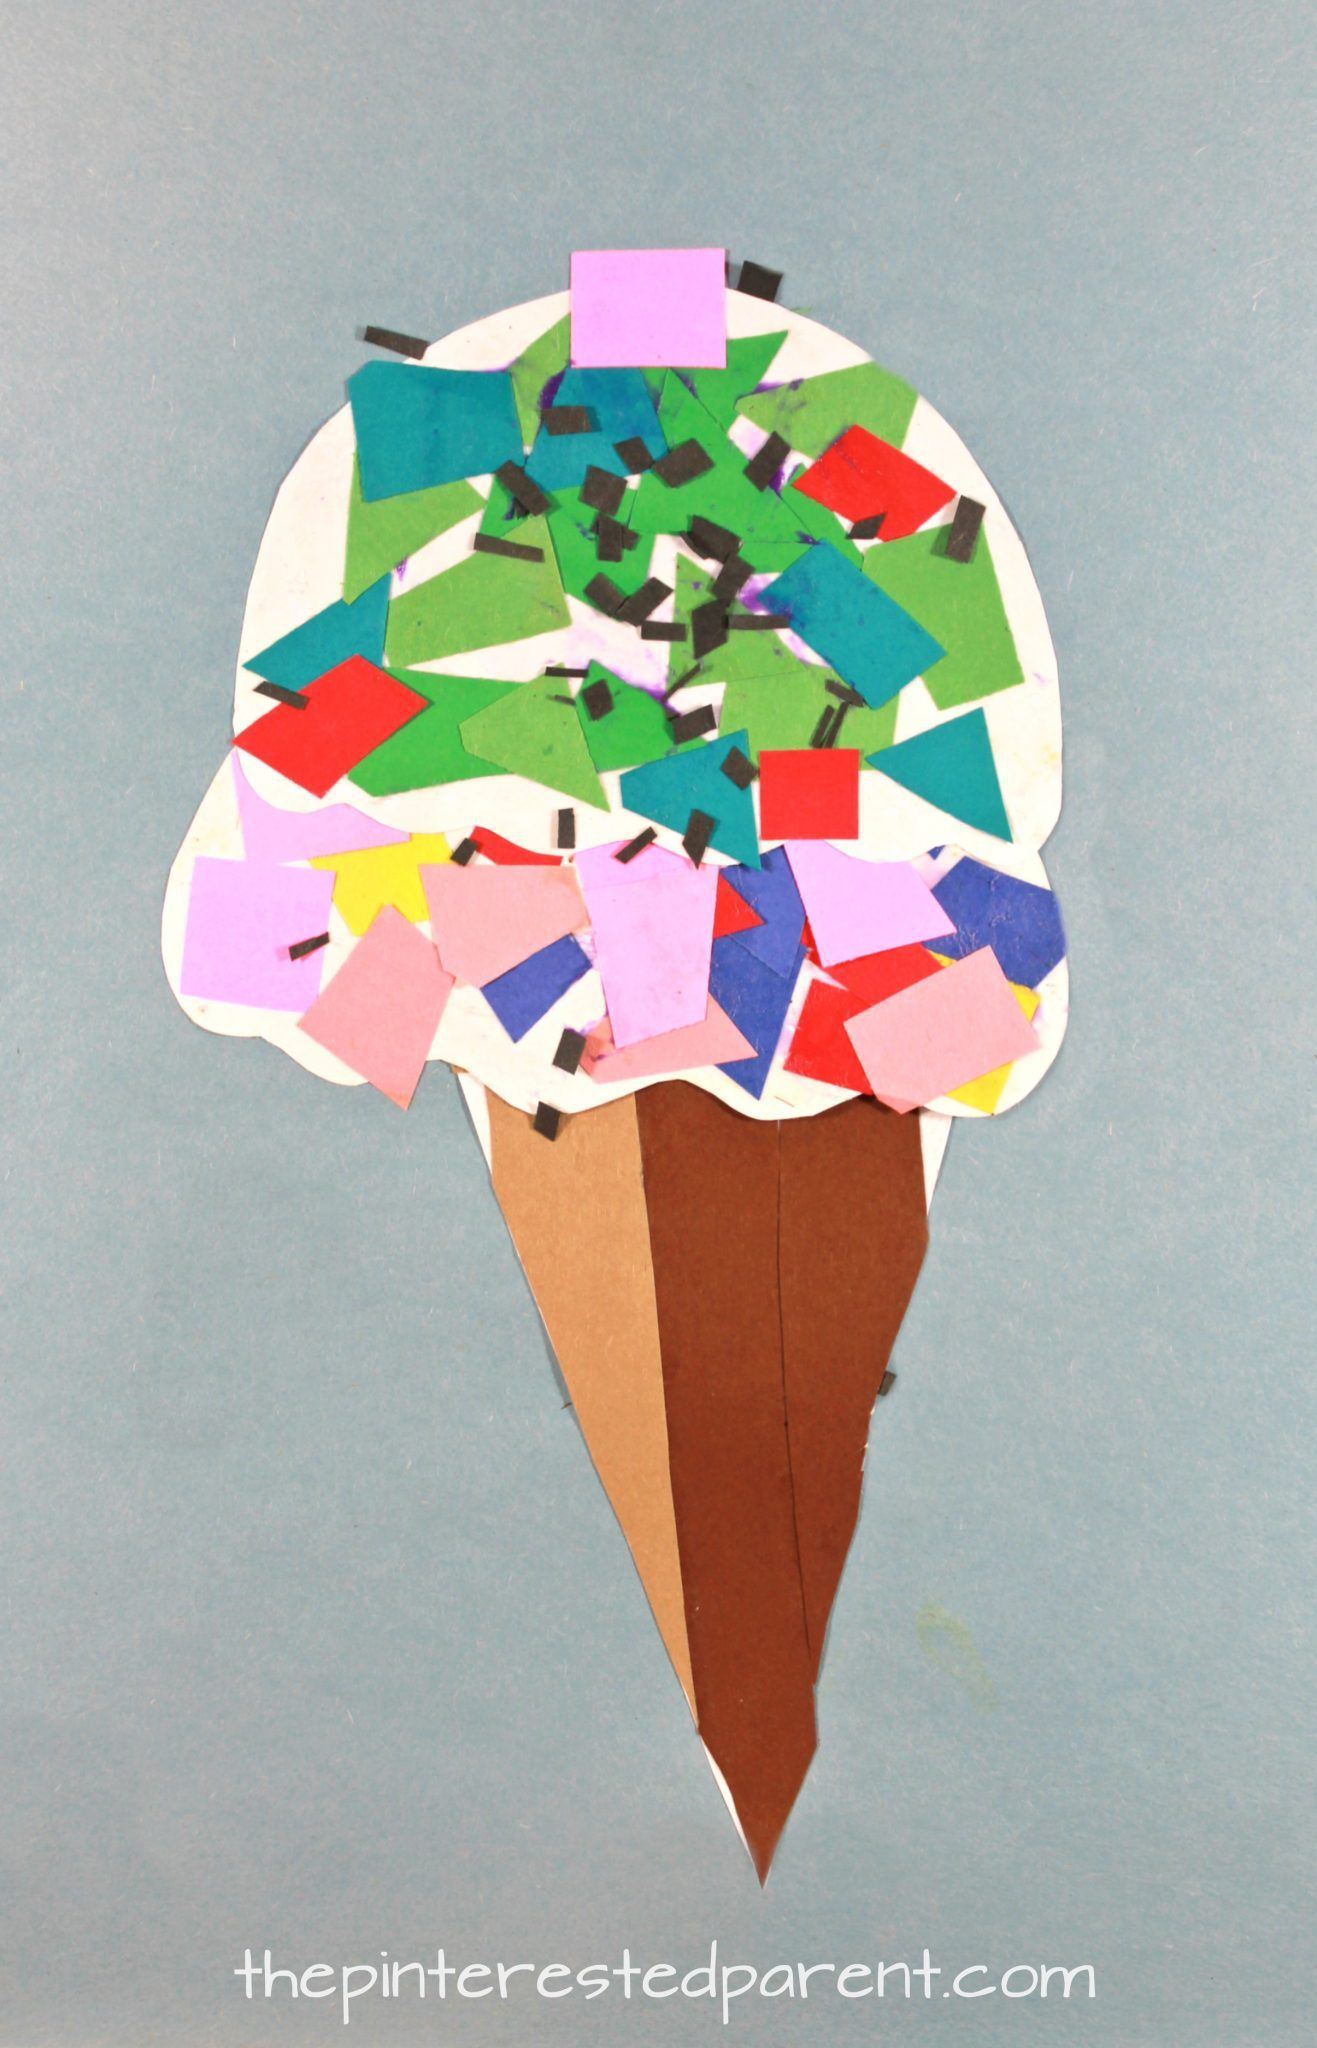 Printable Paper Mosaic Ice Cream Cone Kids Summer Arts Crafts